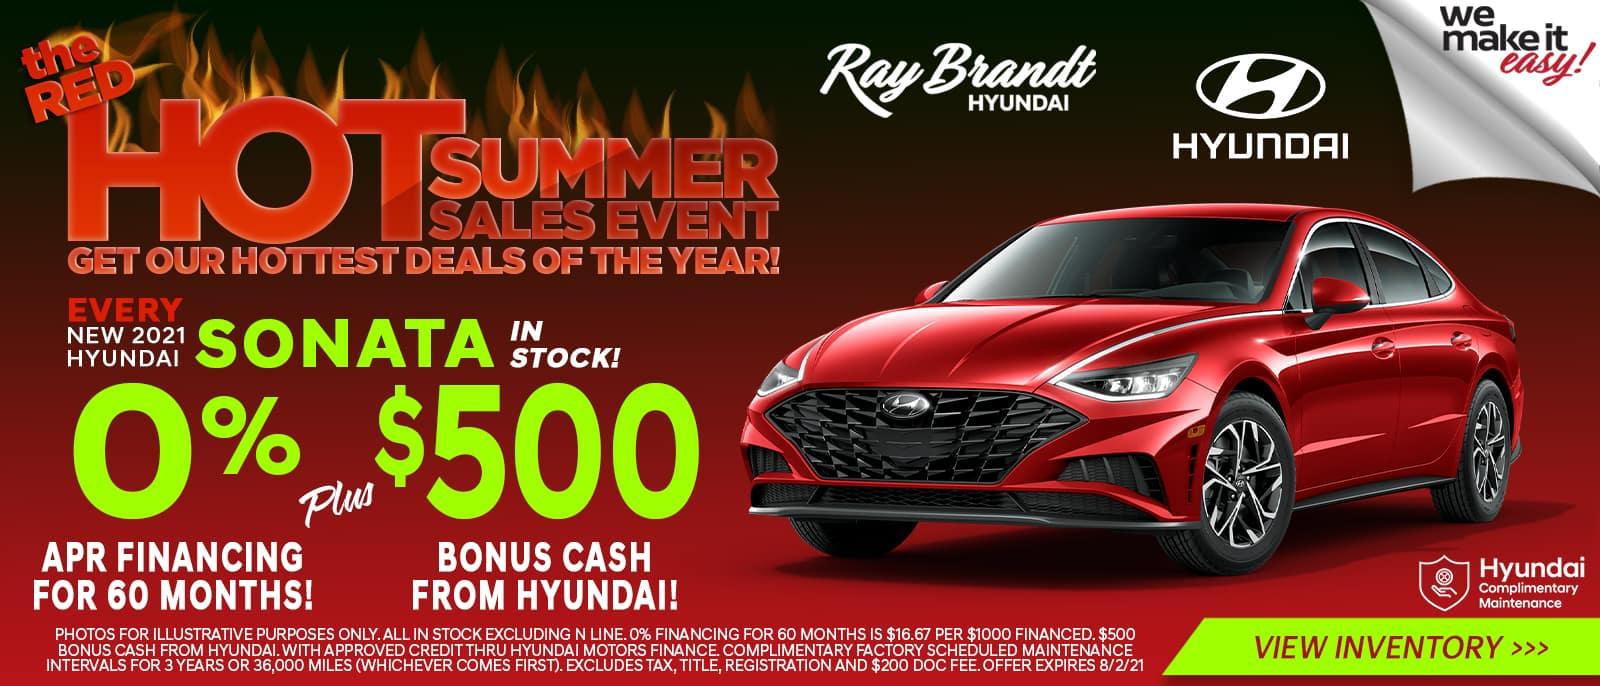 New 2021 Hyundai Sonata Sales Special